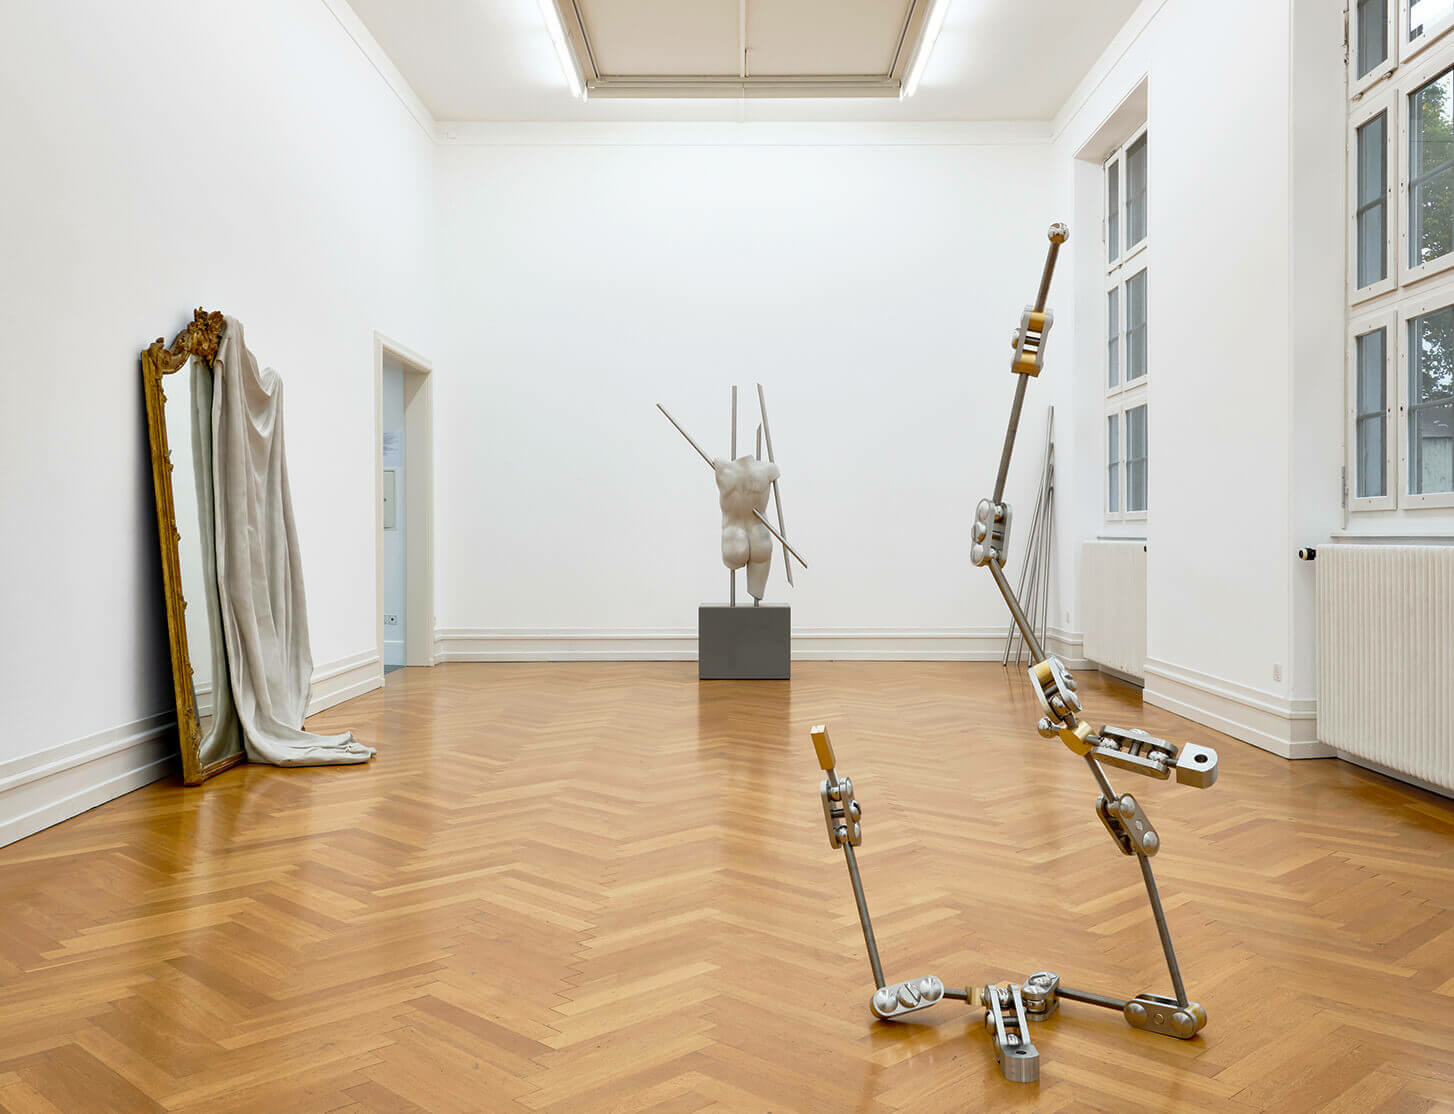 Exhibition by Ryan Gander opens at Kunsthalle Bern